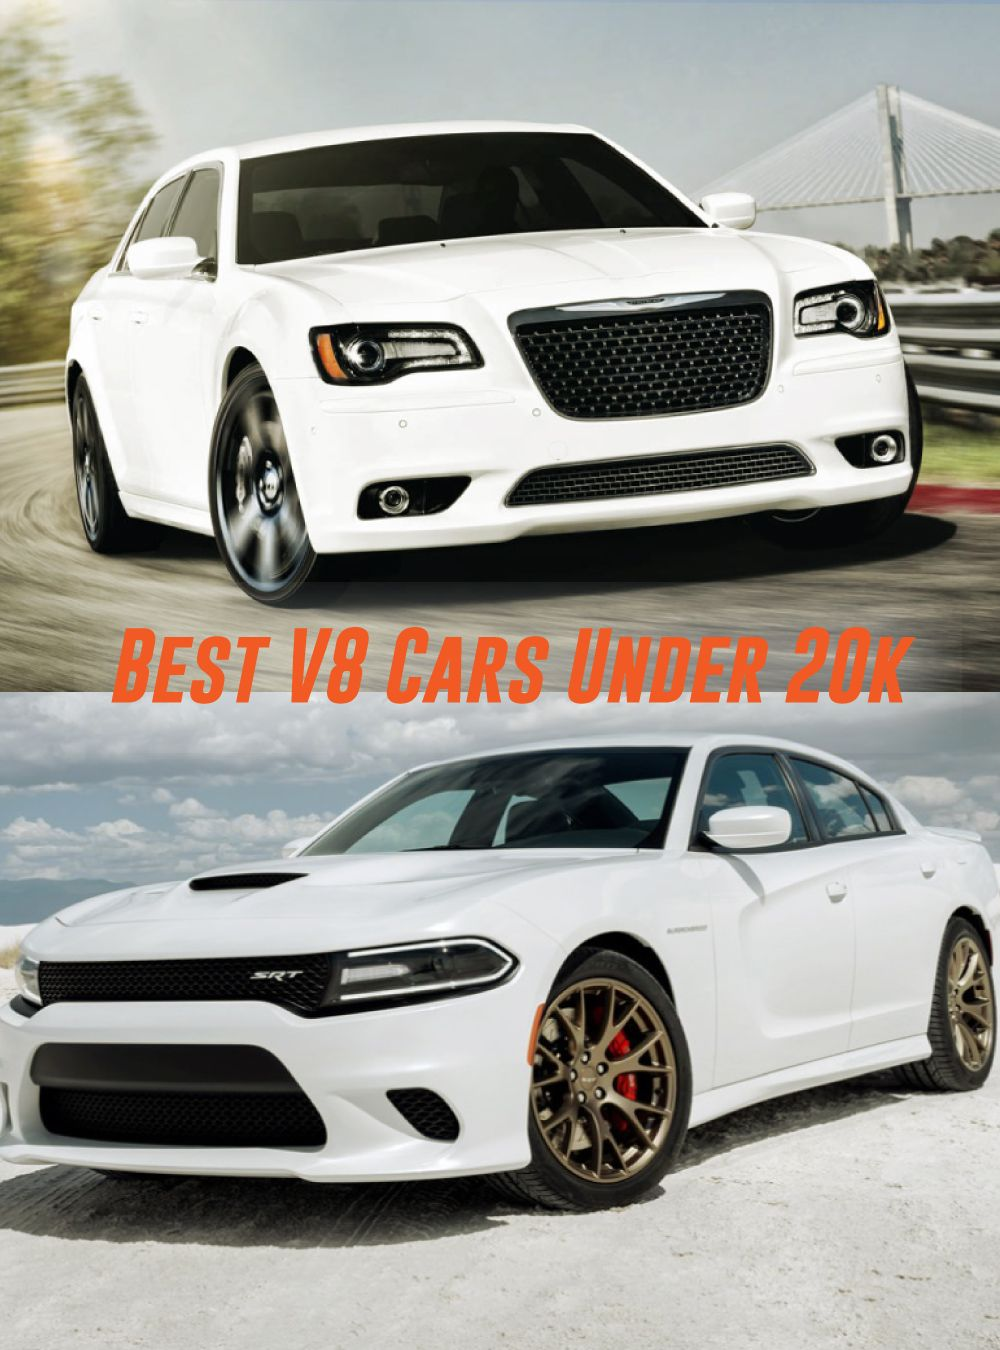 Best V8 Cars Under 20k in 2020 Affordable sports cars